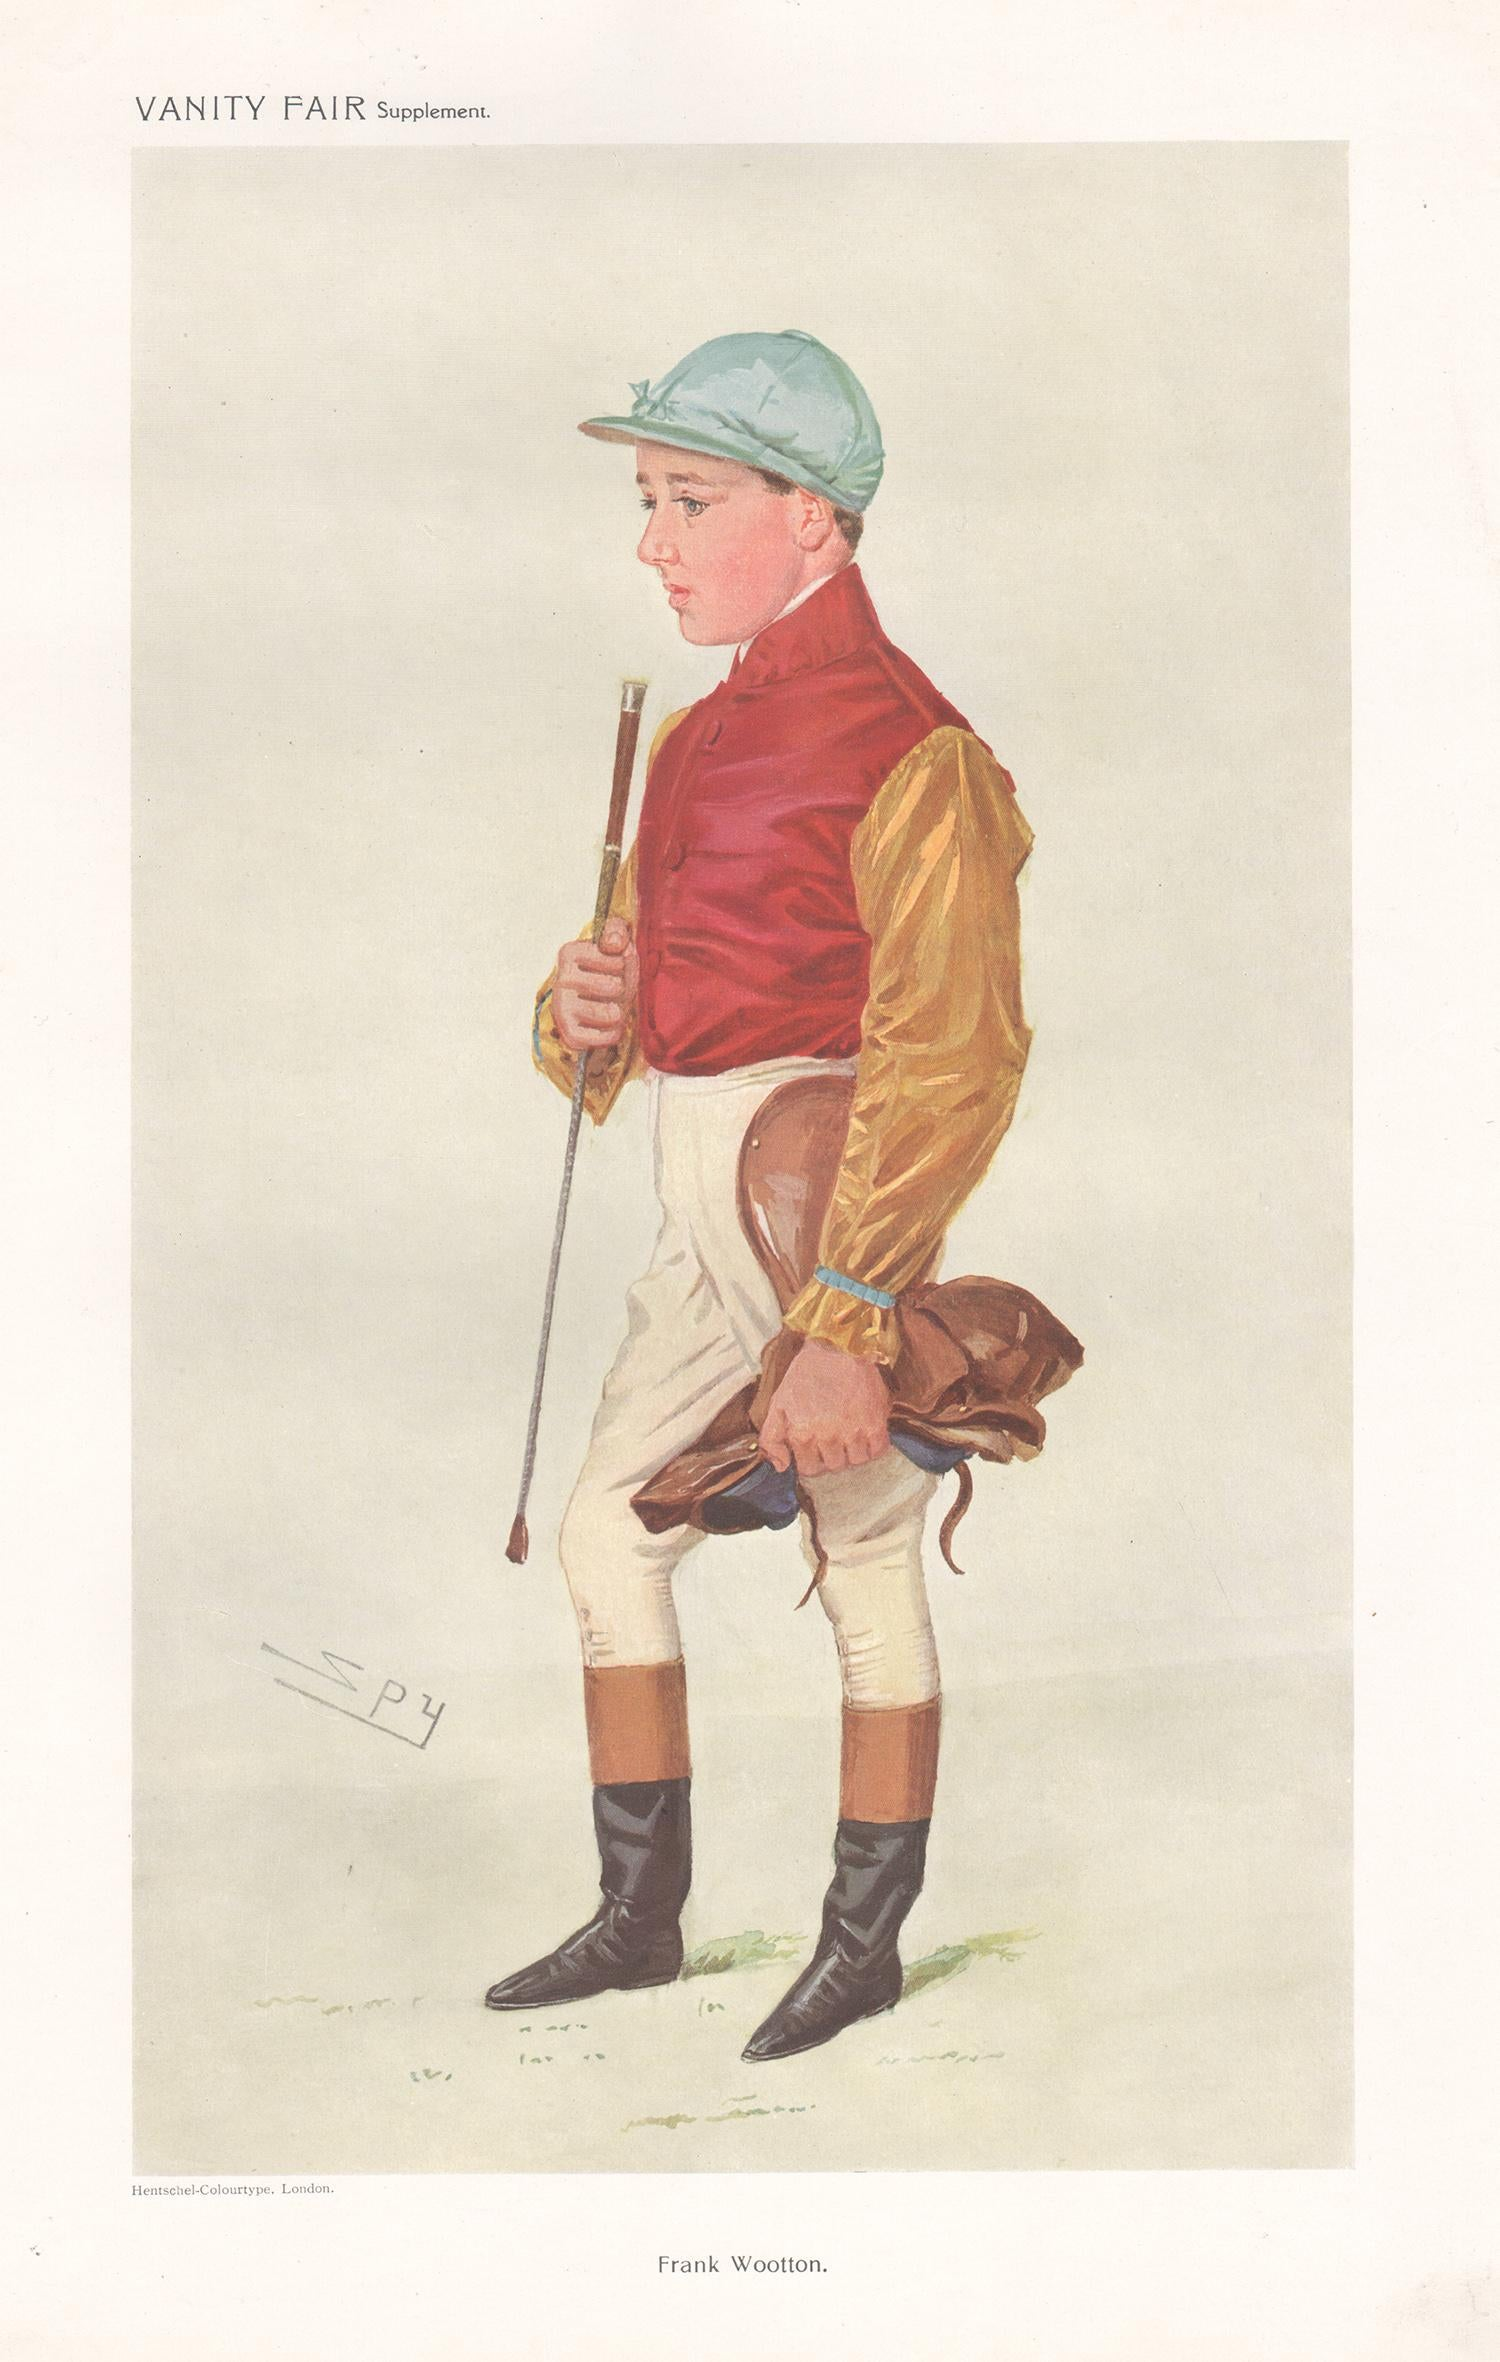 Frank Wootton, jockey, Vanity Fair horse racing portrait chromolithograph, 1909